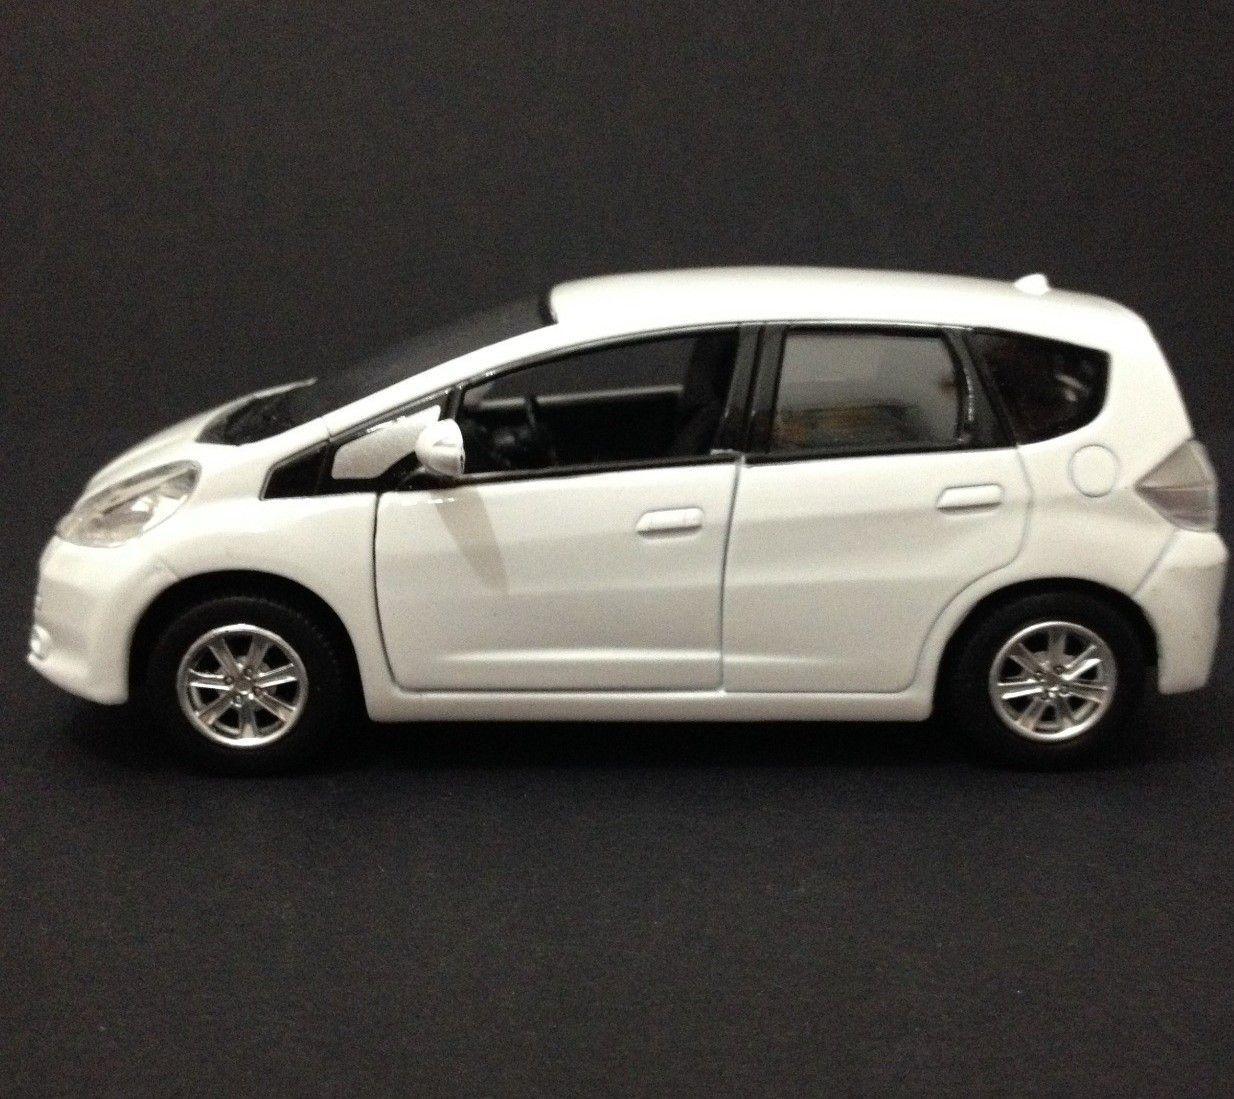 Honda Fit Branco - Escala 1:32